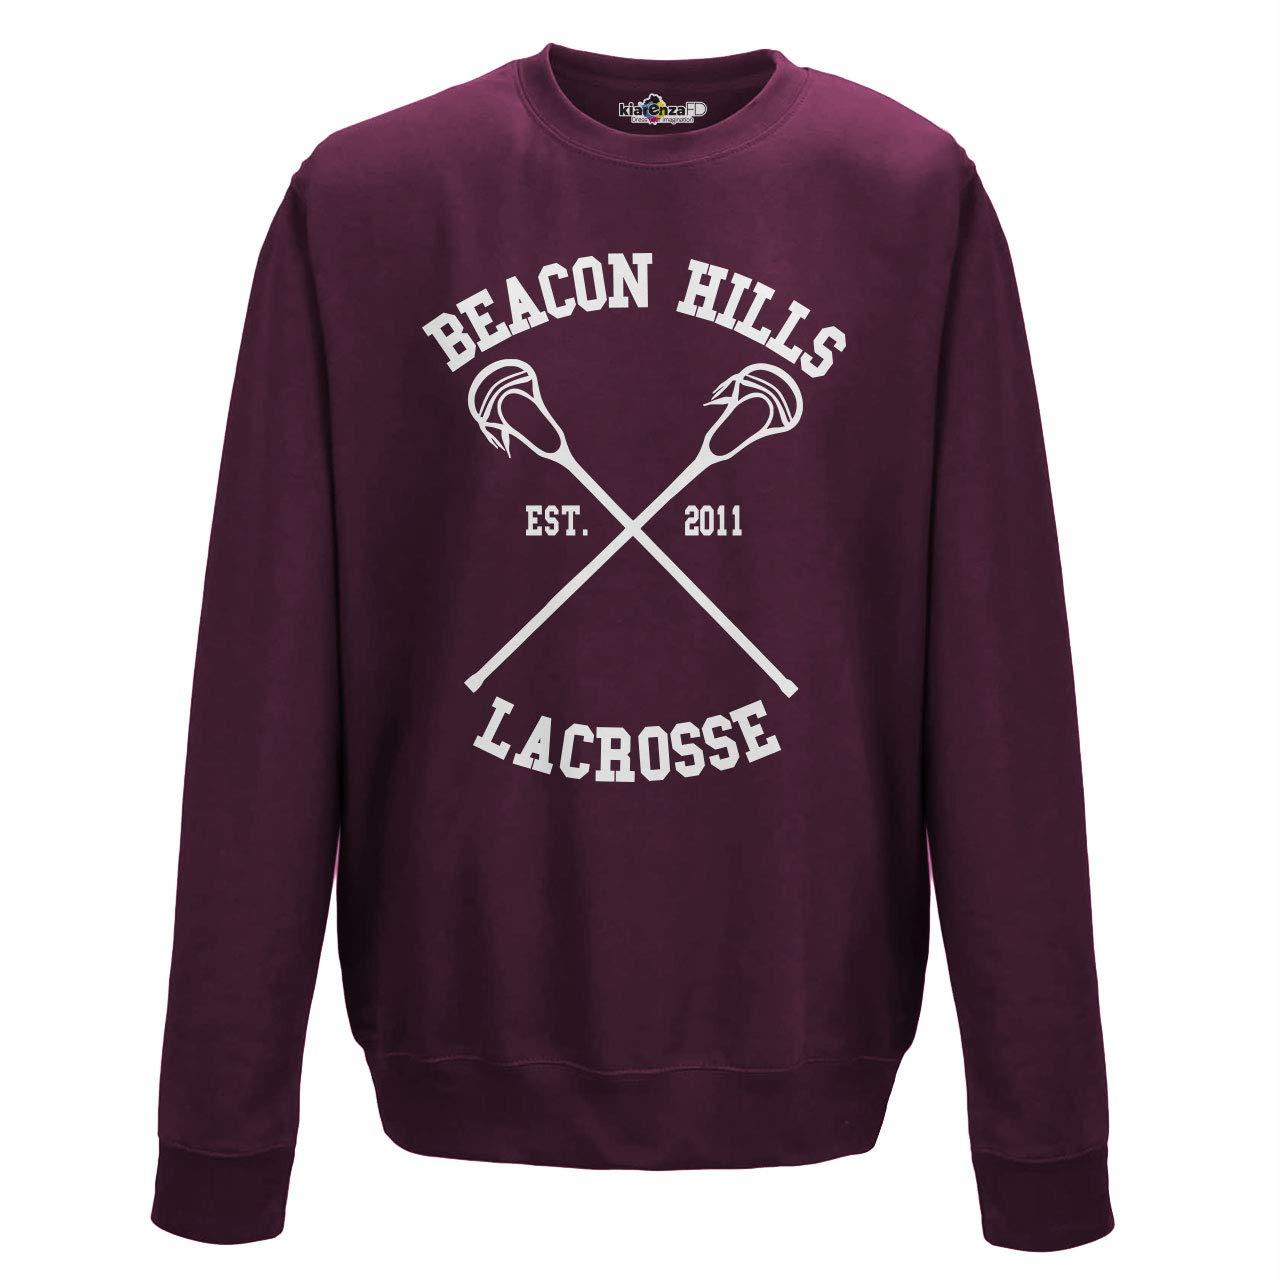 KiarenzaFD Felpa Girocollo Lacrosse Beacon Hills Stilinski McCall Lahey 11 Serie TV Uomo